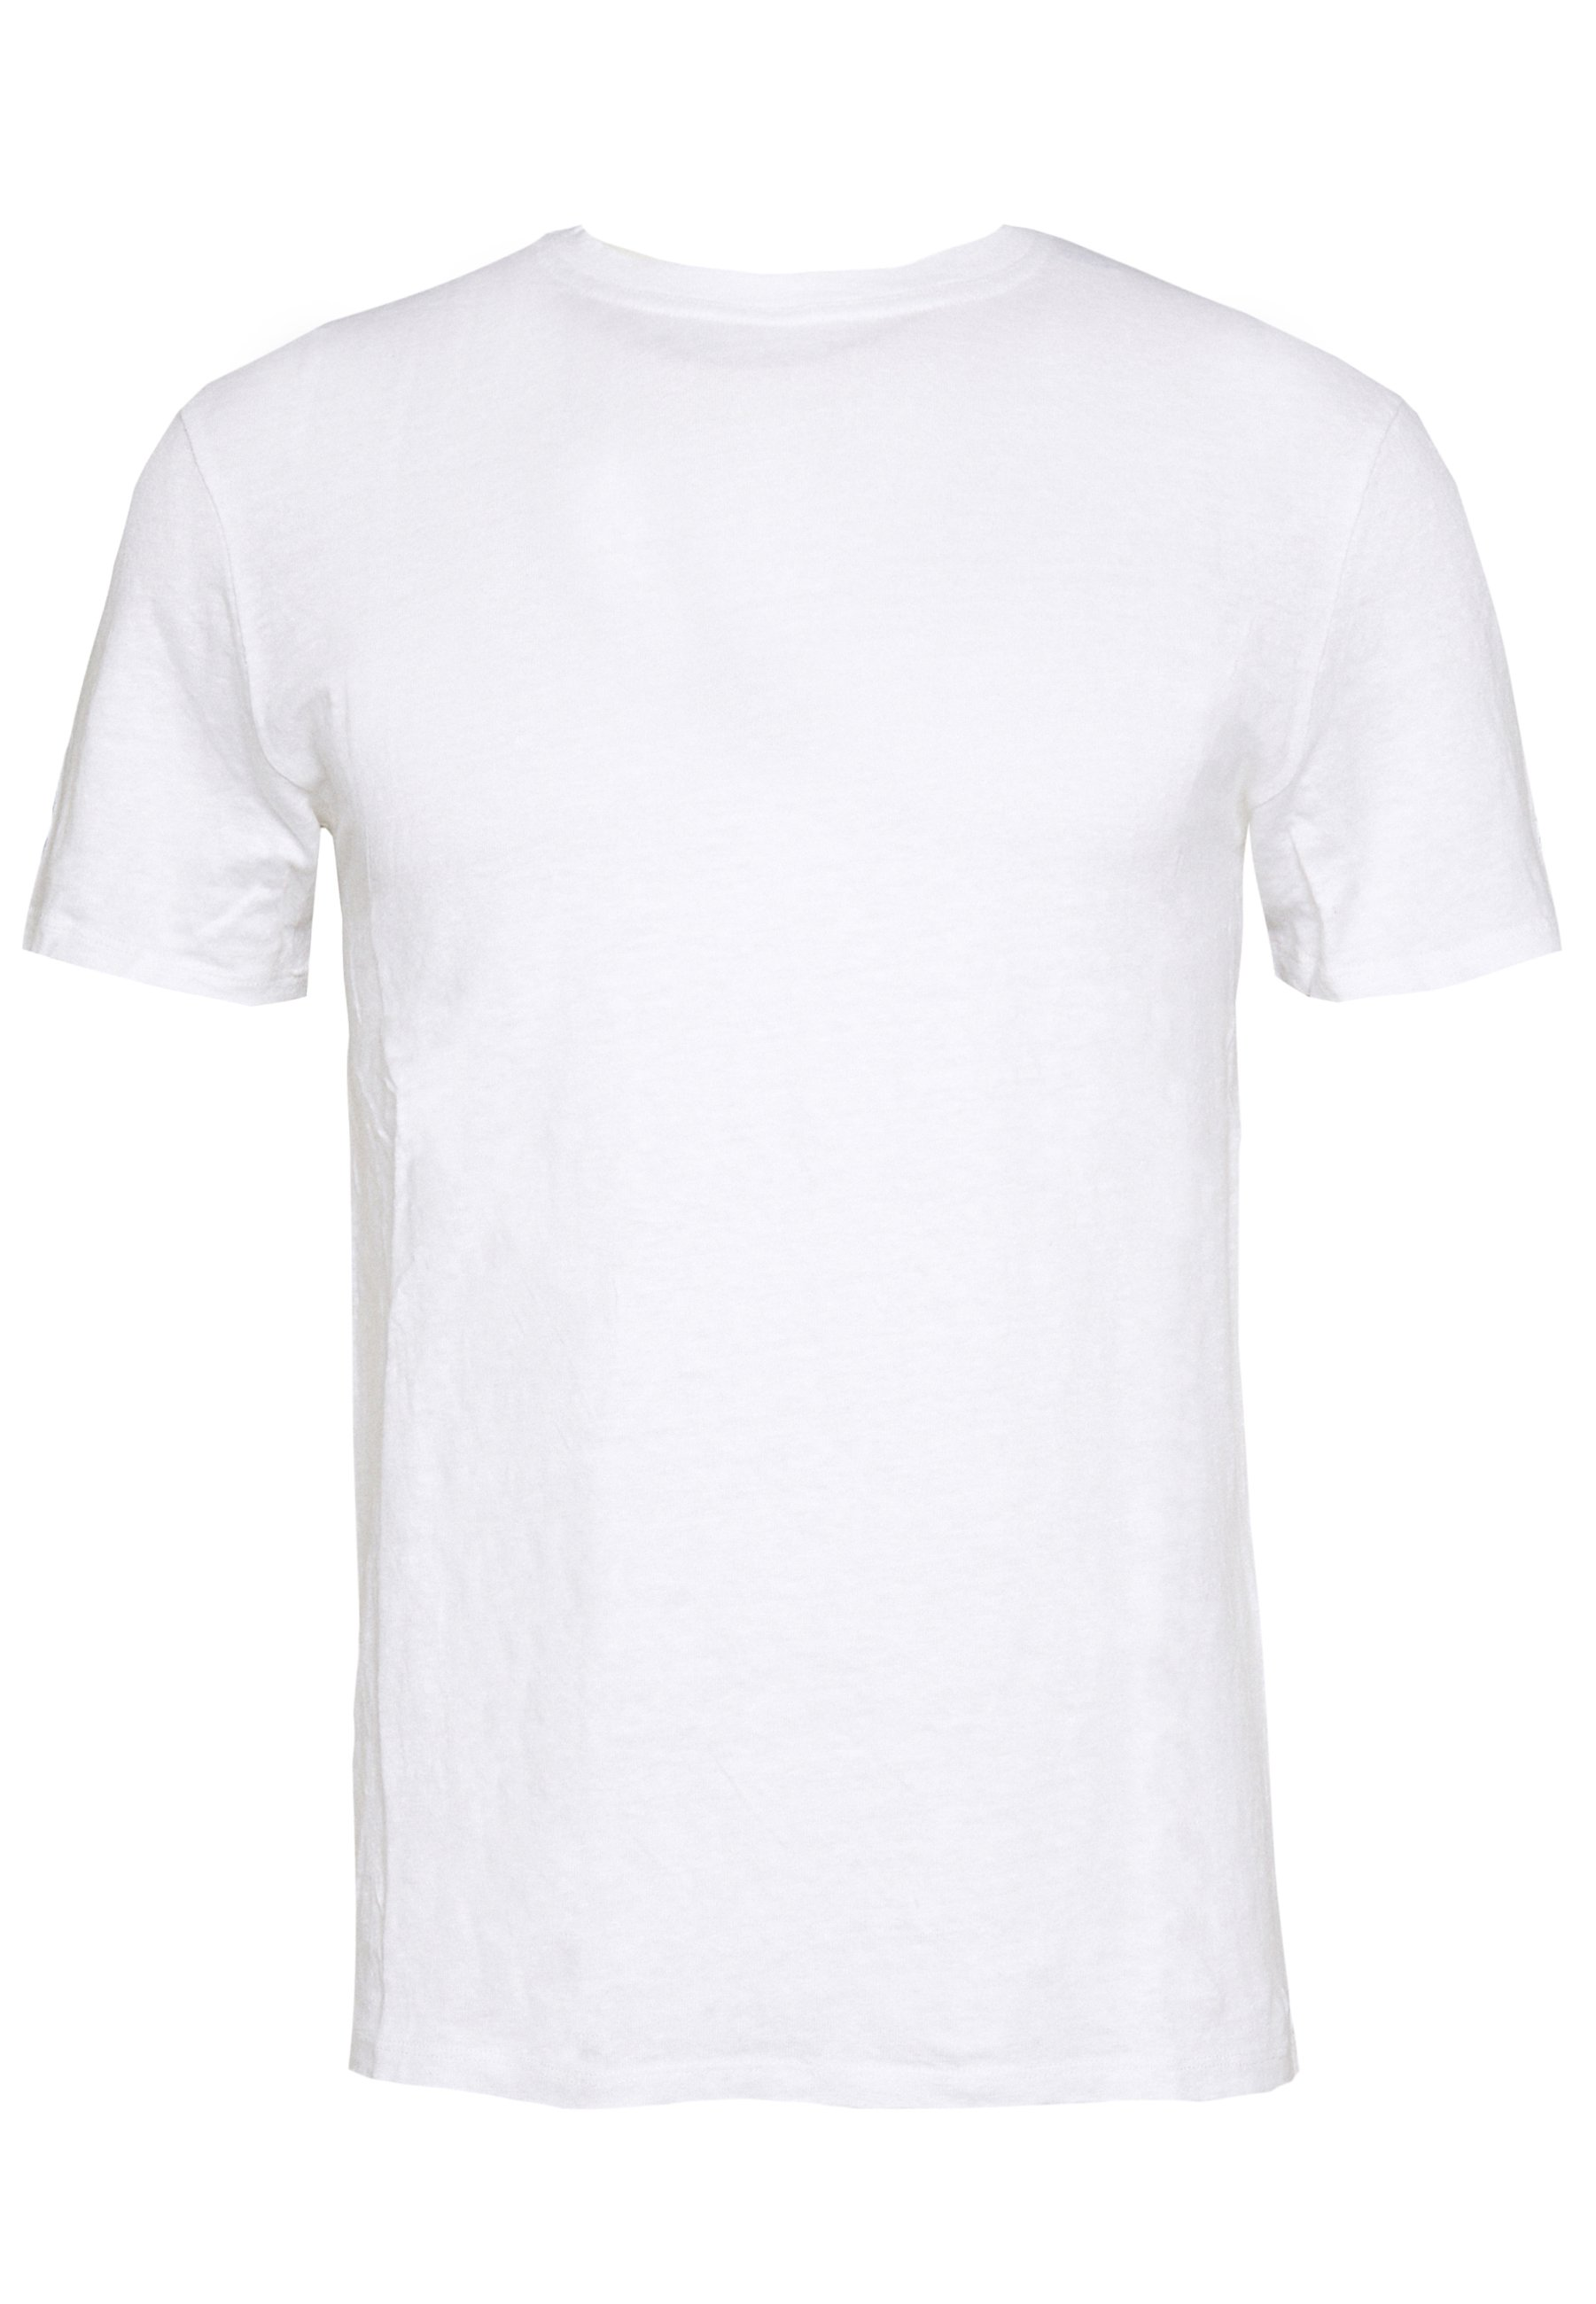 Tiger of Sweden Skjorte Shirt Blanche Hvit Skjorter